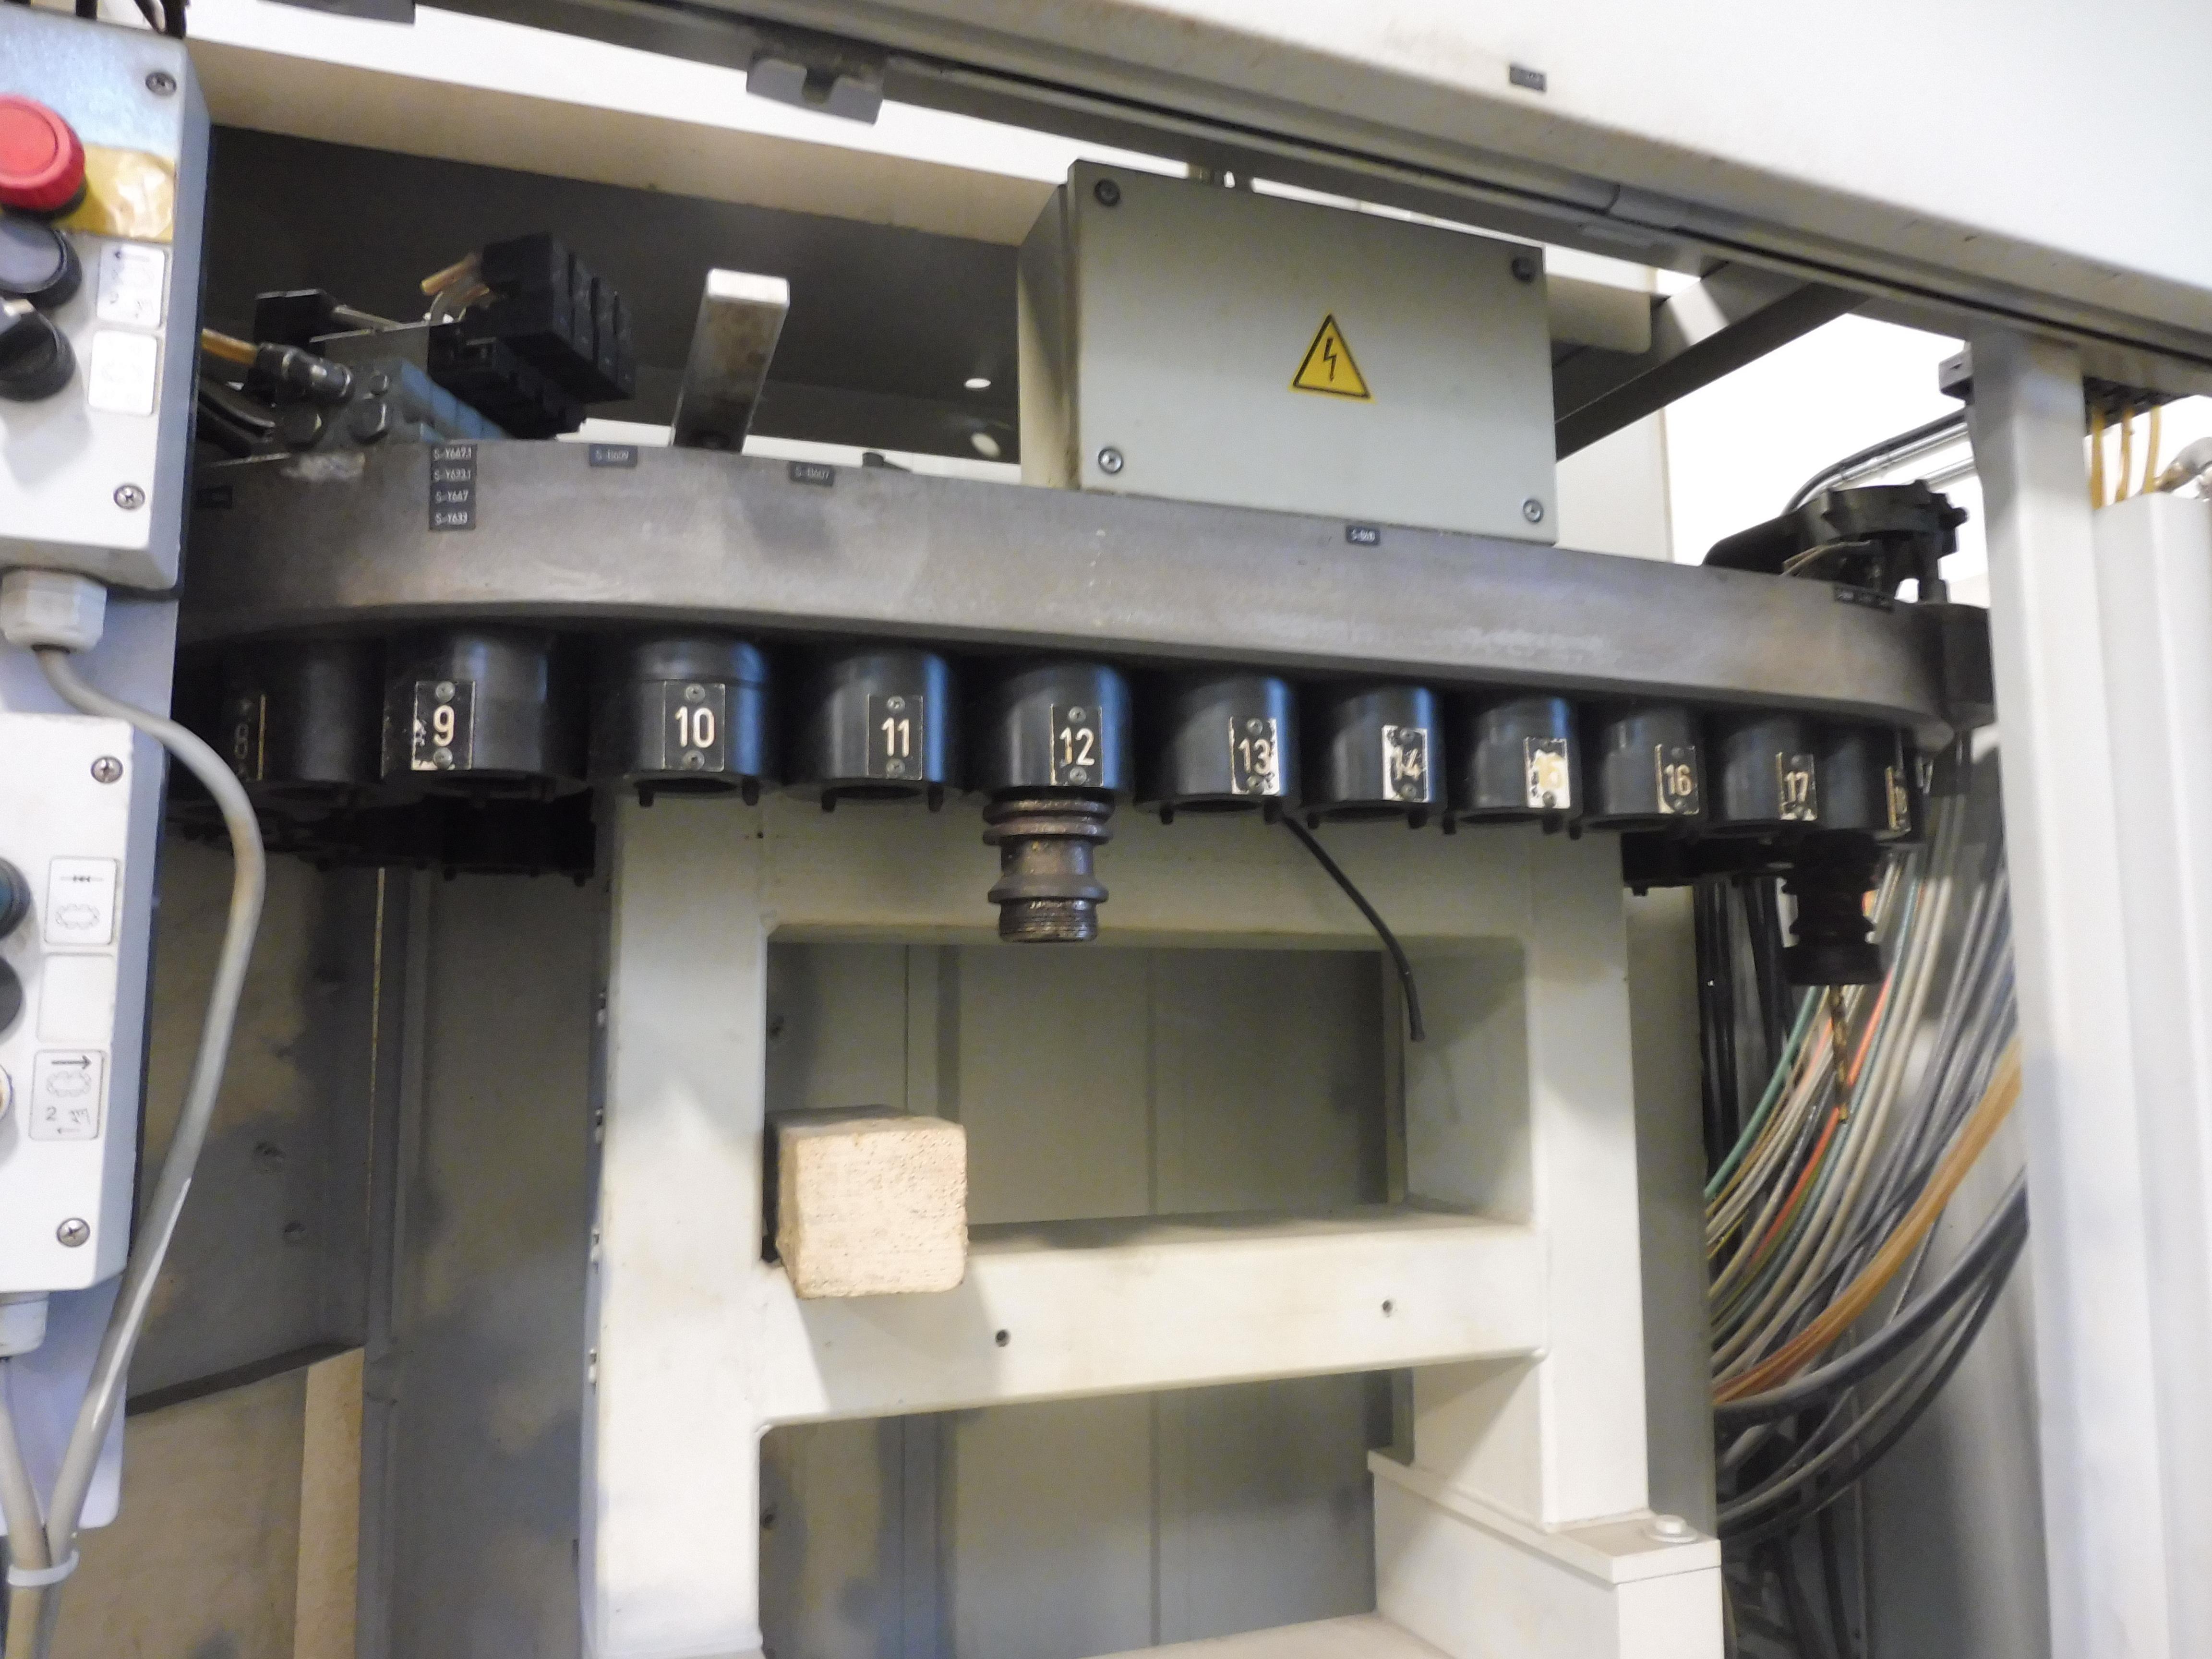 Lot 5 - 1999 MIKRON MODEL UPC-1000 CNC 5-AXIS HIGH SPEED MACHINING CENTRE, S/N 71.15, WITH HEIDENHAIN TNC-